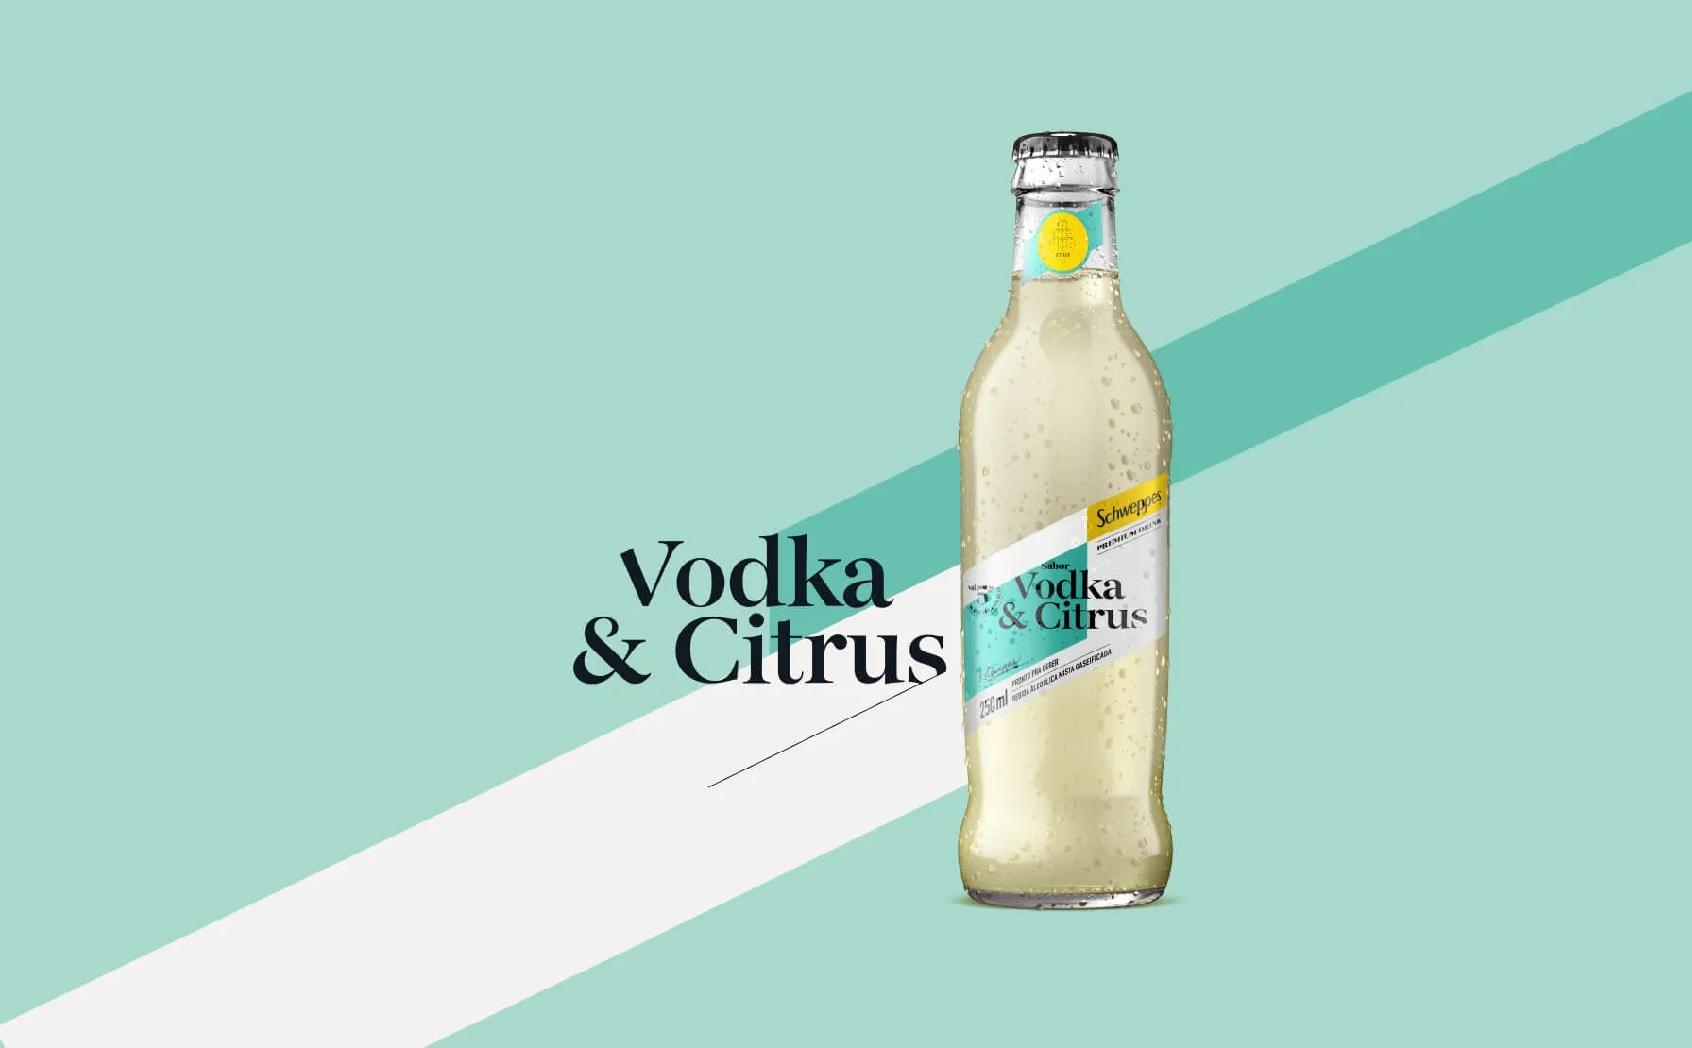 Schweppes Vodka & Citrus, da Coca-Cola